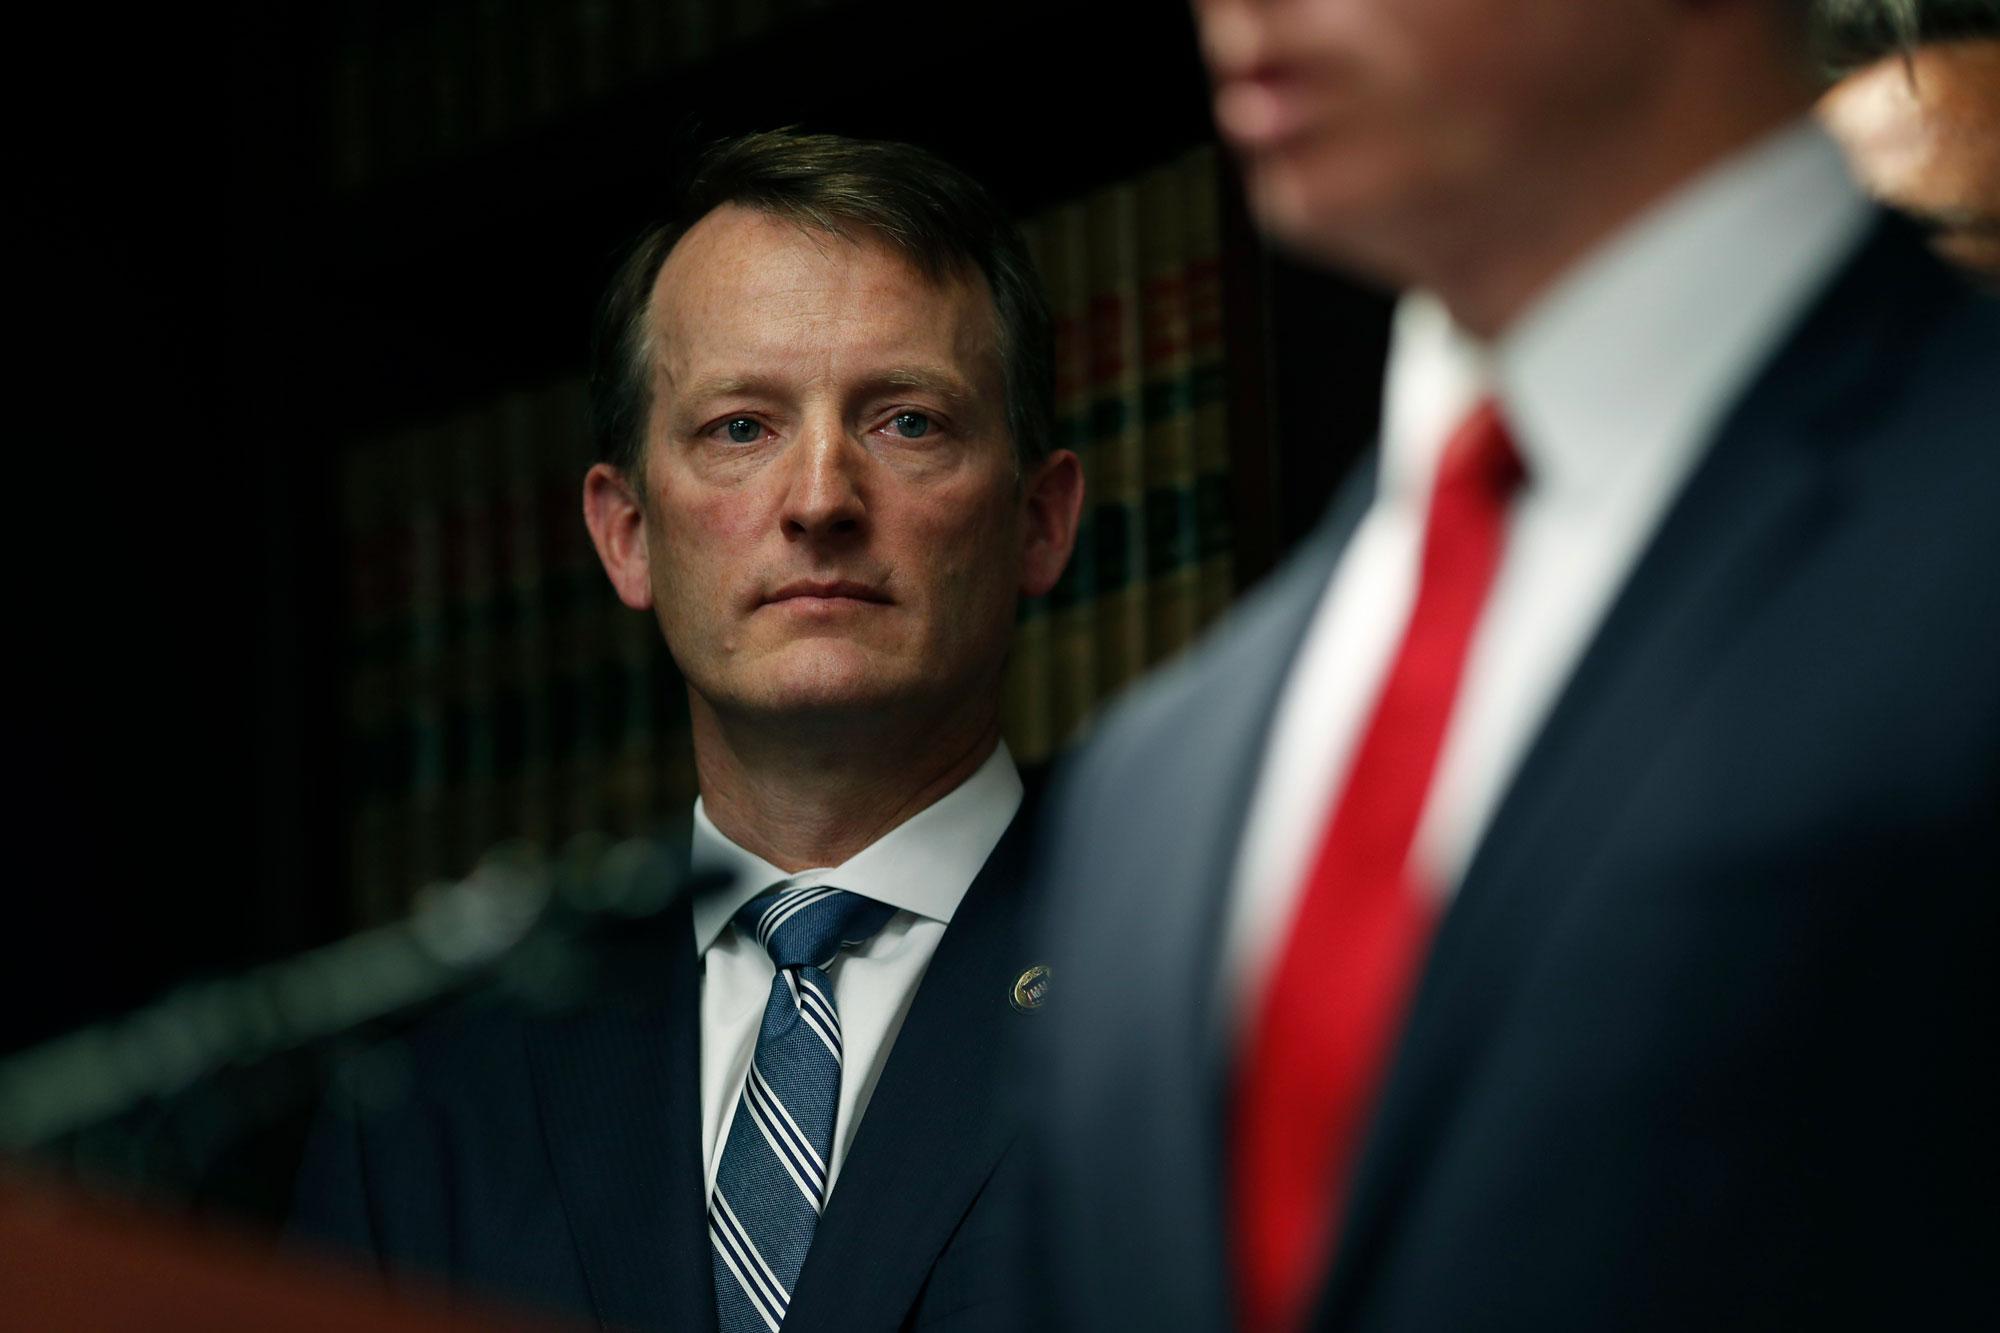 Photo: U.S. Attorney Jason Dunn